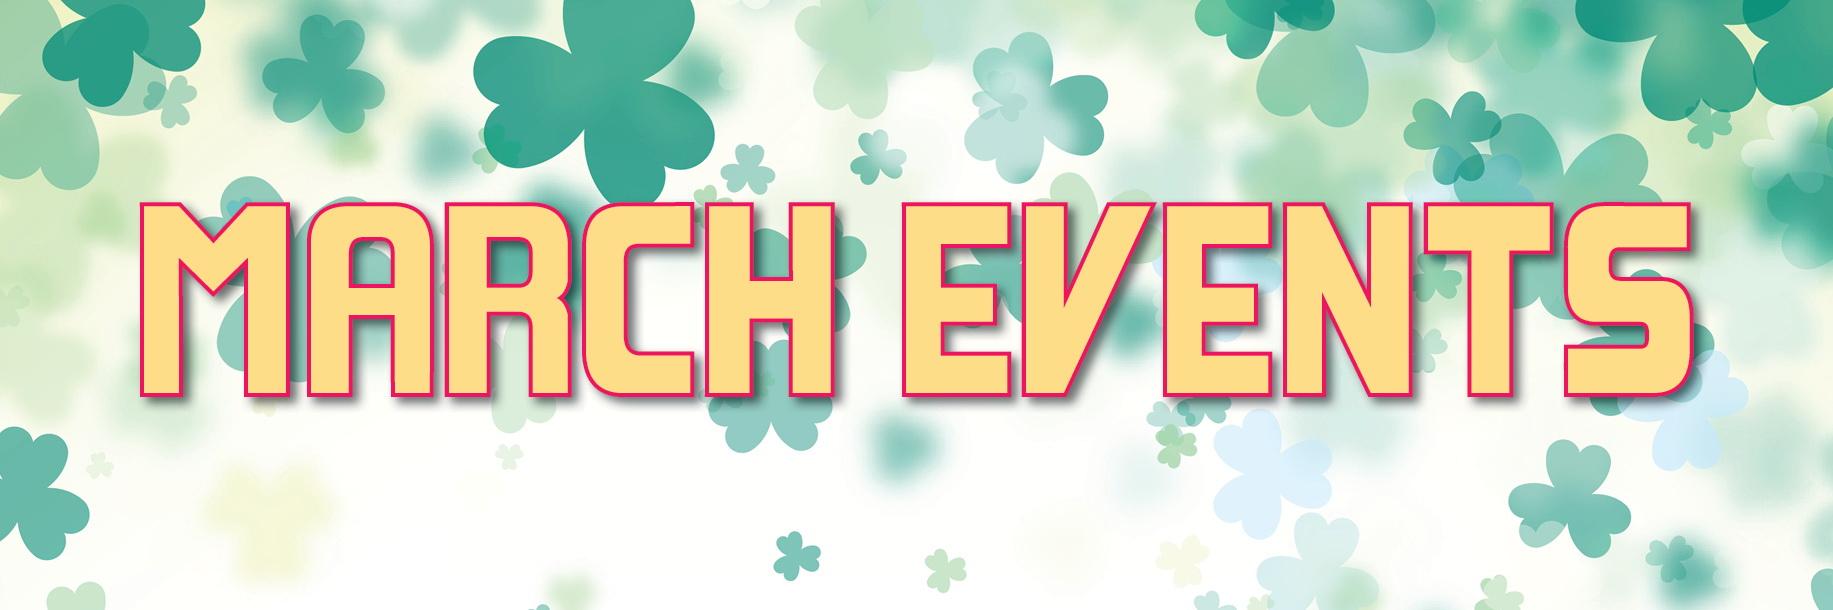 March17 Event Slider